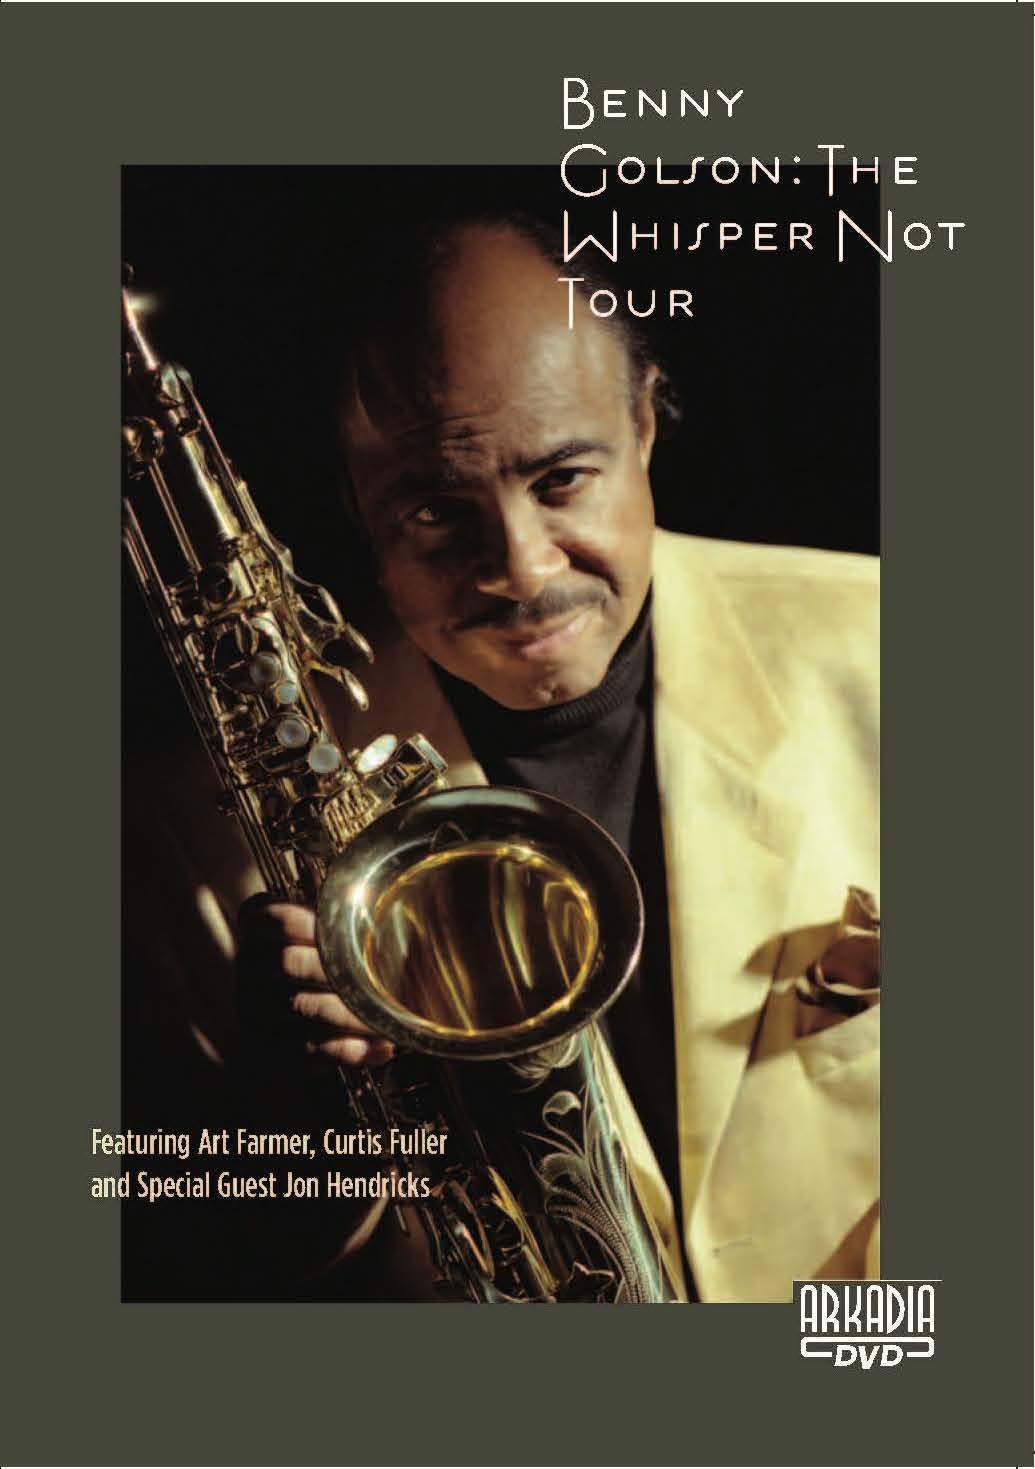 Benny Golson: The Whisper Not Tour